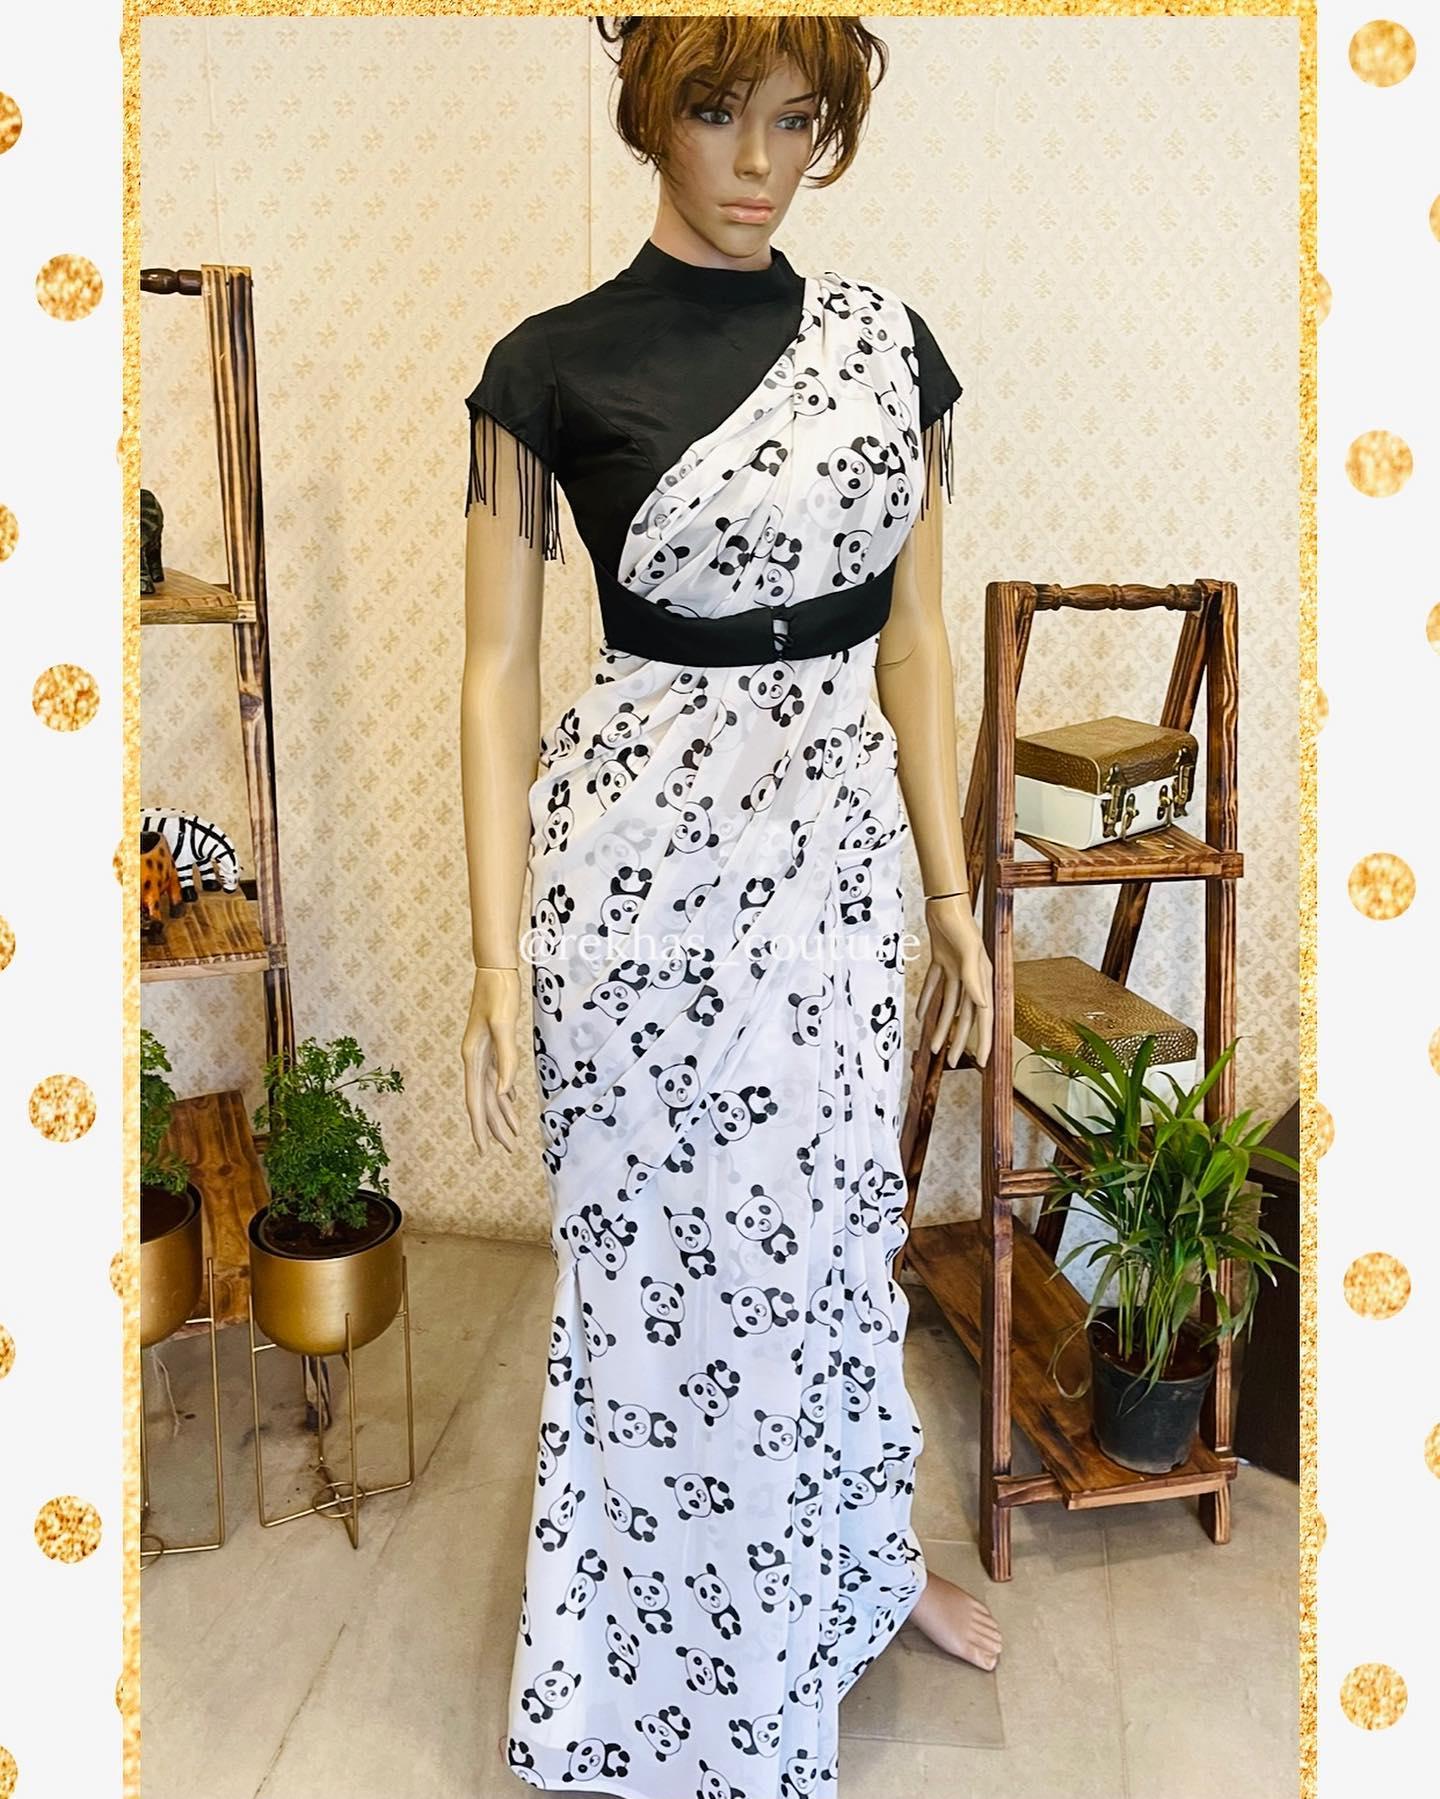 Gorgeous pearl white color designer and black high neck waist belt blouse. Saree with panda print. Panda hug  whatsapp  or  7893545554. 2021-04-04